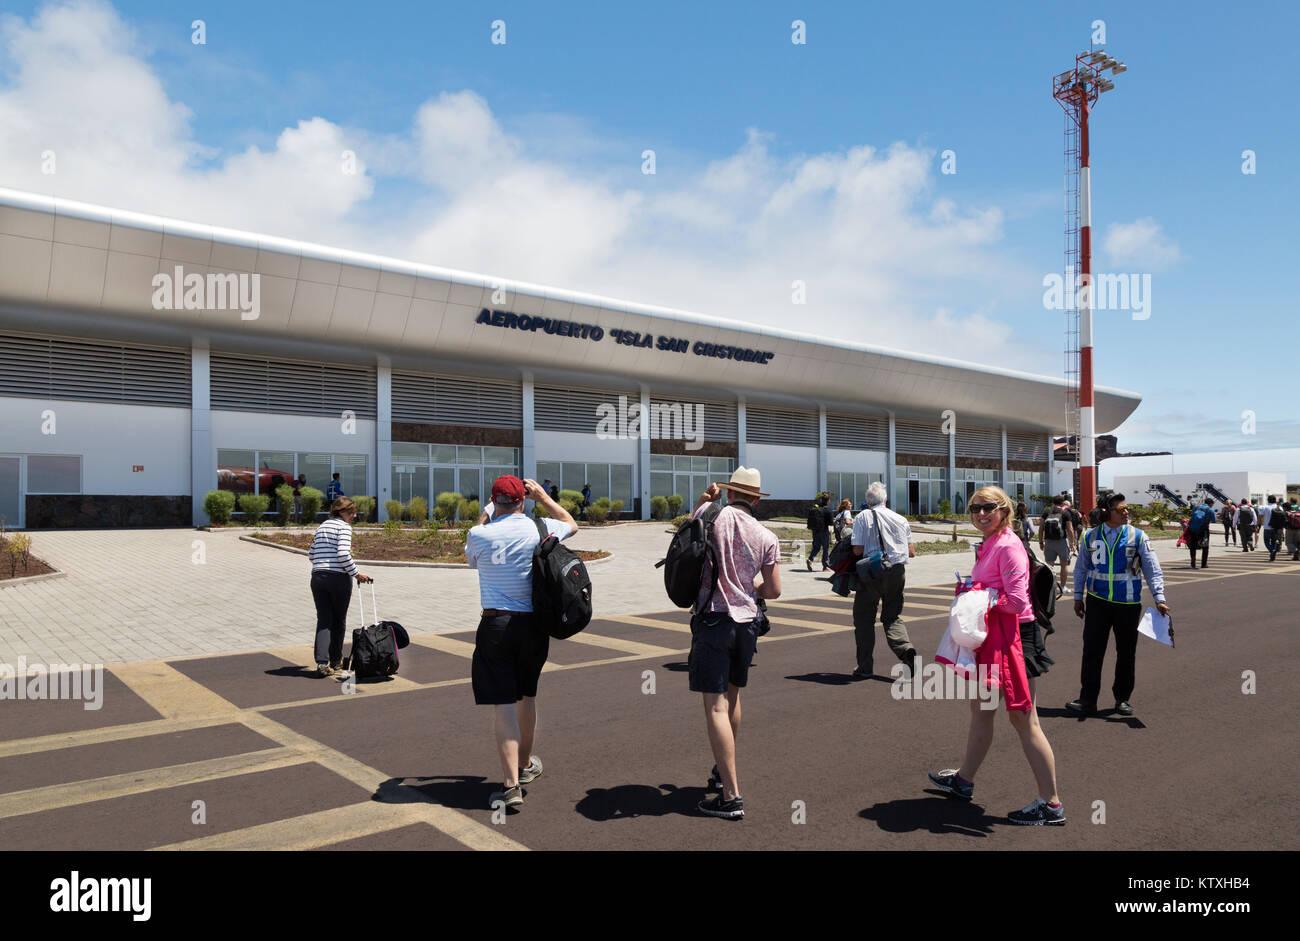 Passengers arriving at San Cristobal Airport, San Christobal Island, Galapagos Islands Ecuador South America - Stock Image